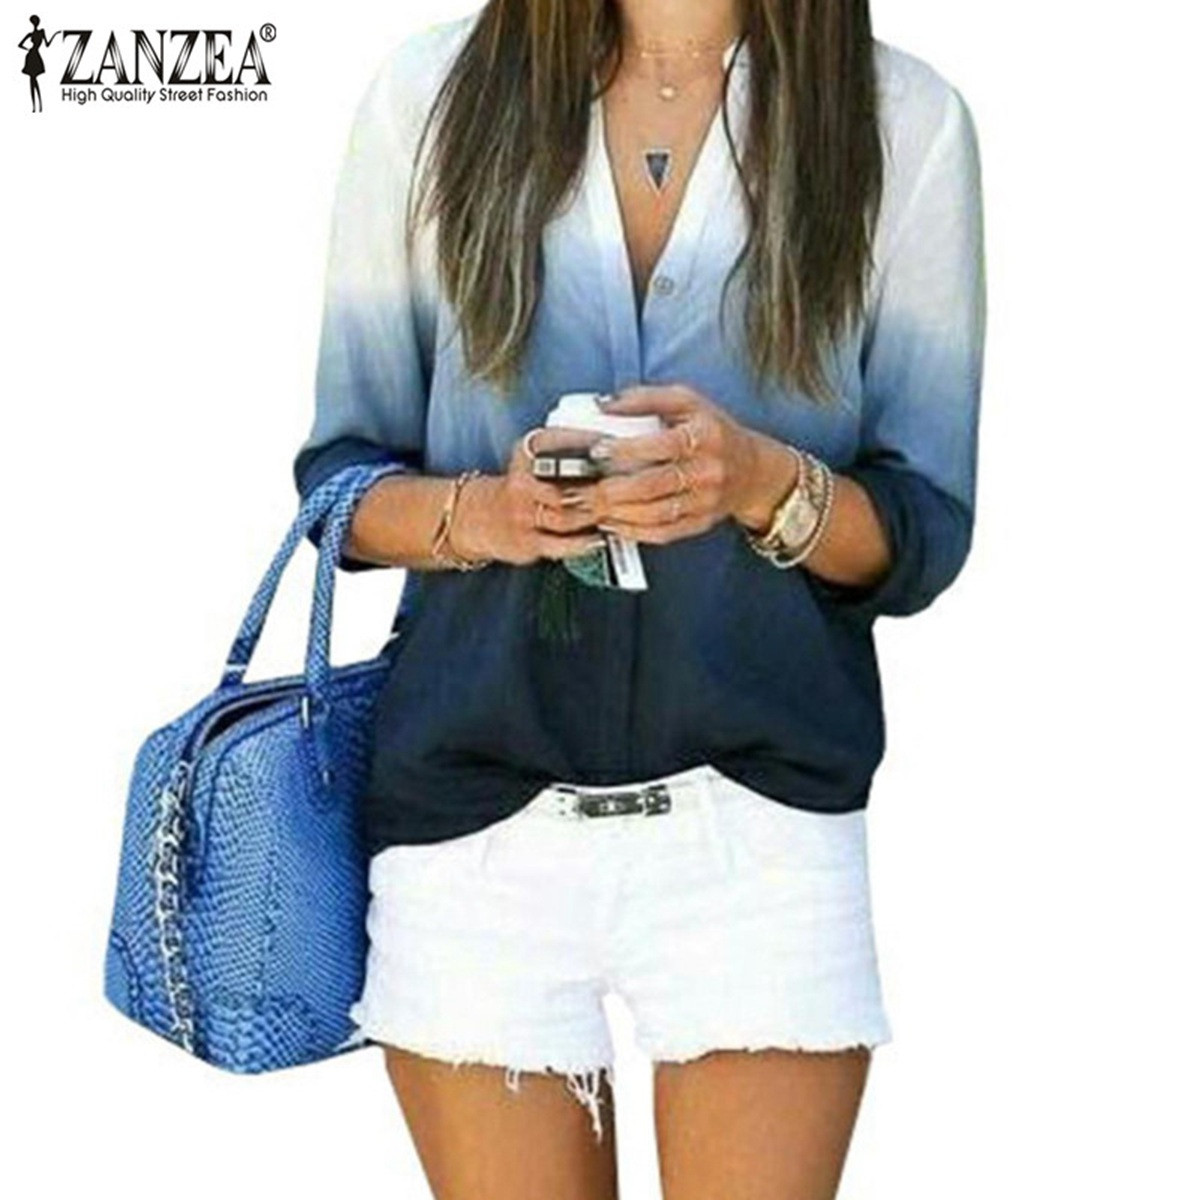 2016 moda mulheres Blusas Casual lazer manga comprida Sexy decote em V Blusas Ladies solto cor gradiente camisas Tops Plus Size S-3XL